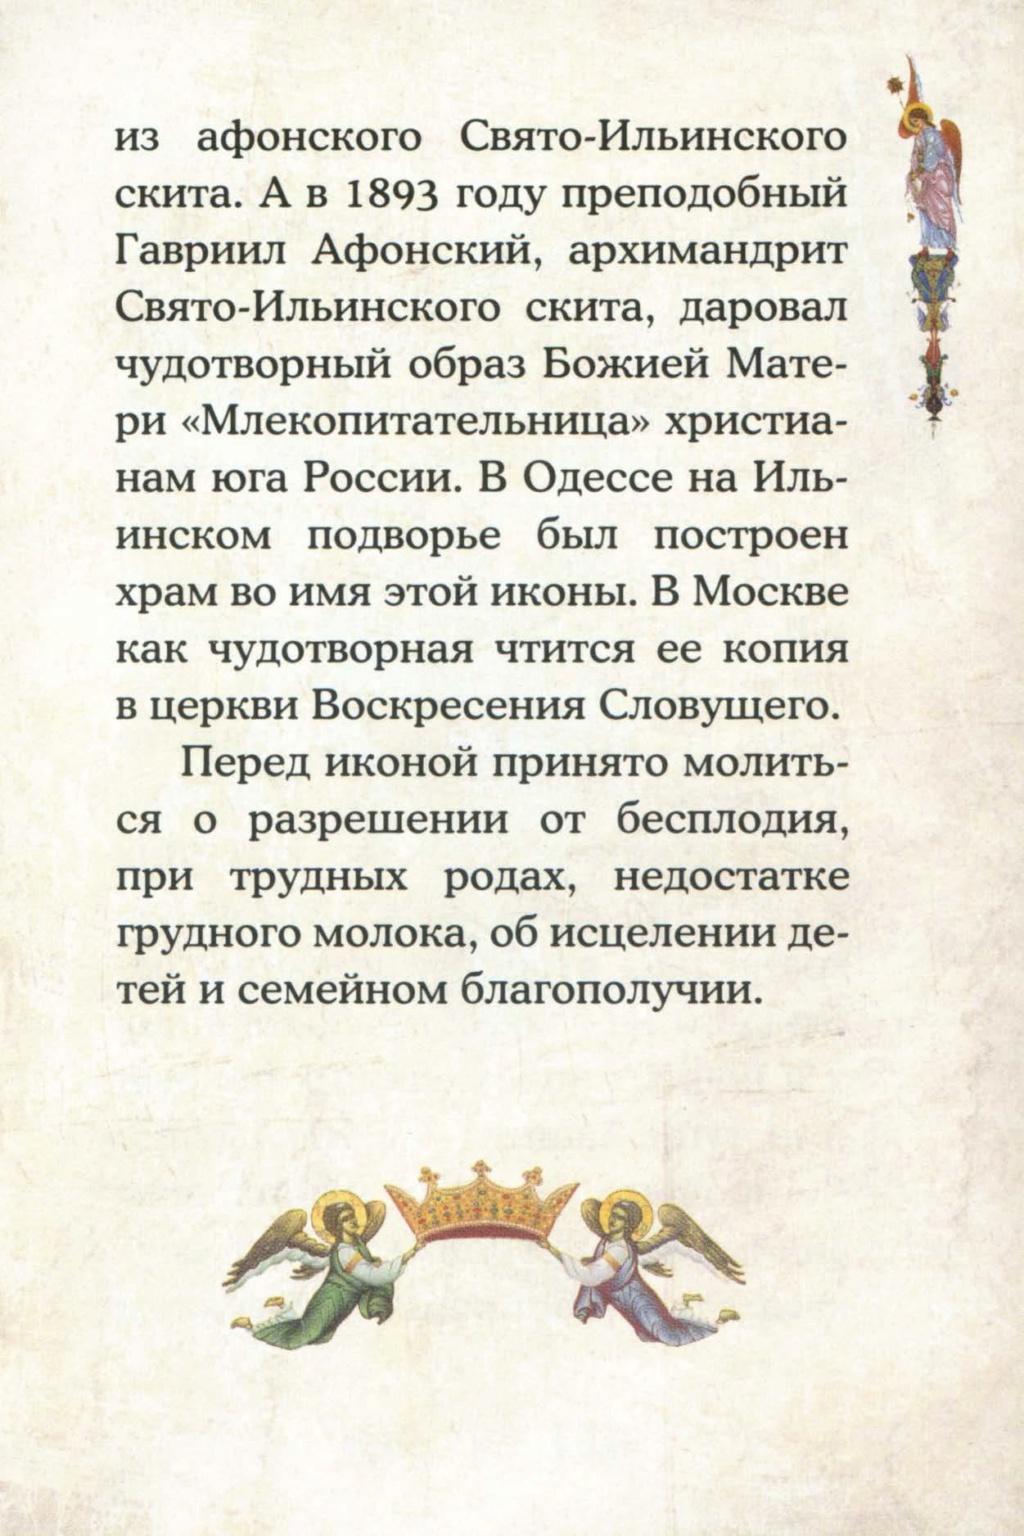 ИКОНА МЛЕКОПИТАТЕЛЬНИЦА Aaao_o13